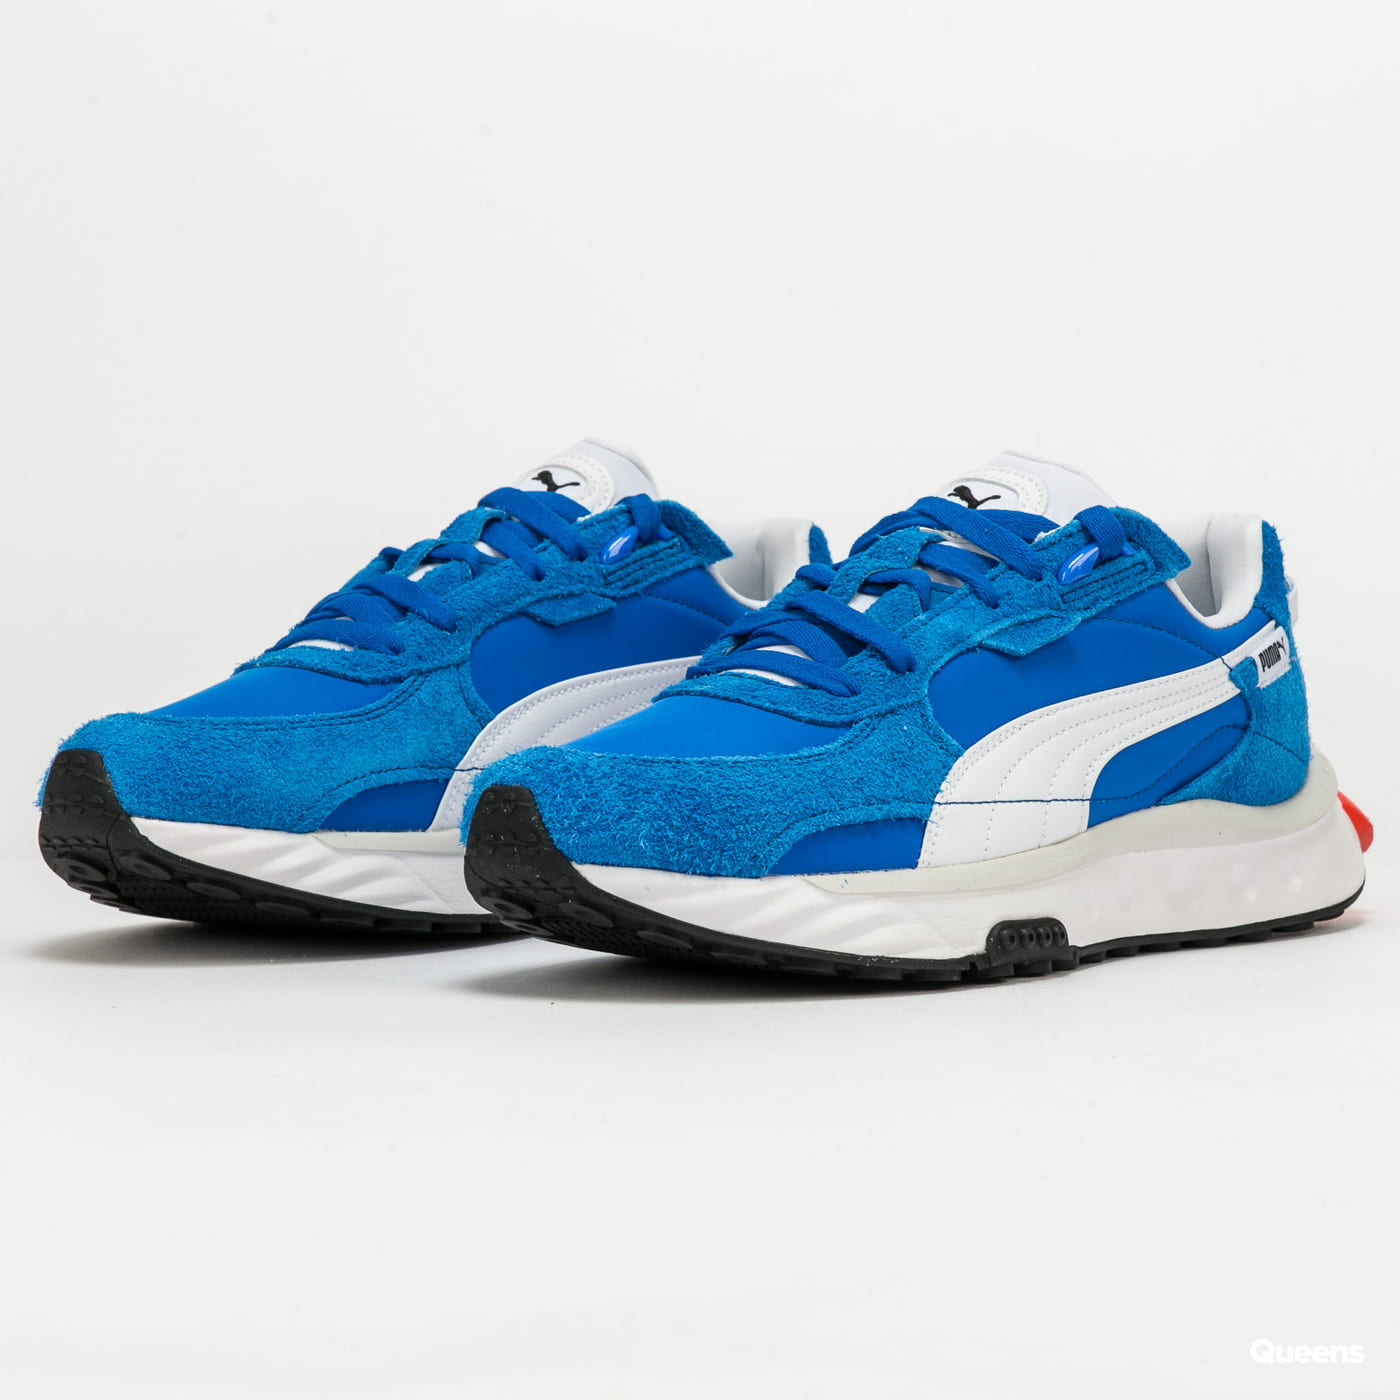 Puma Wild Rider Vintage future blue - bluemazing